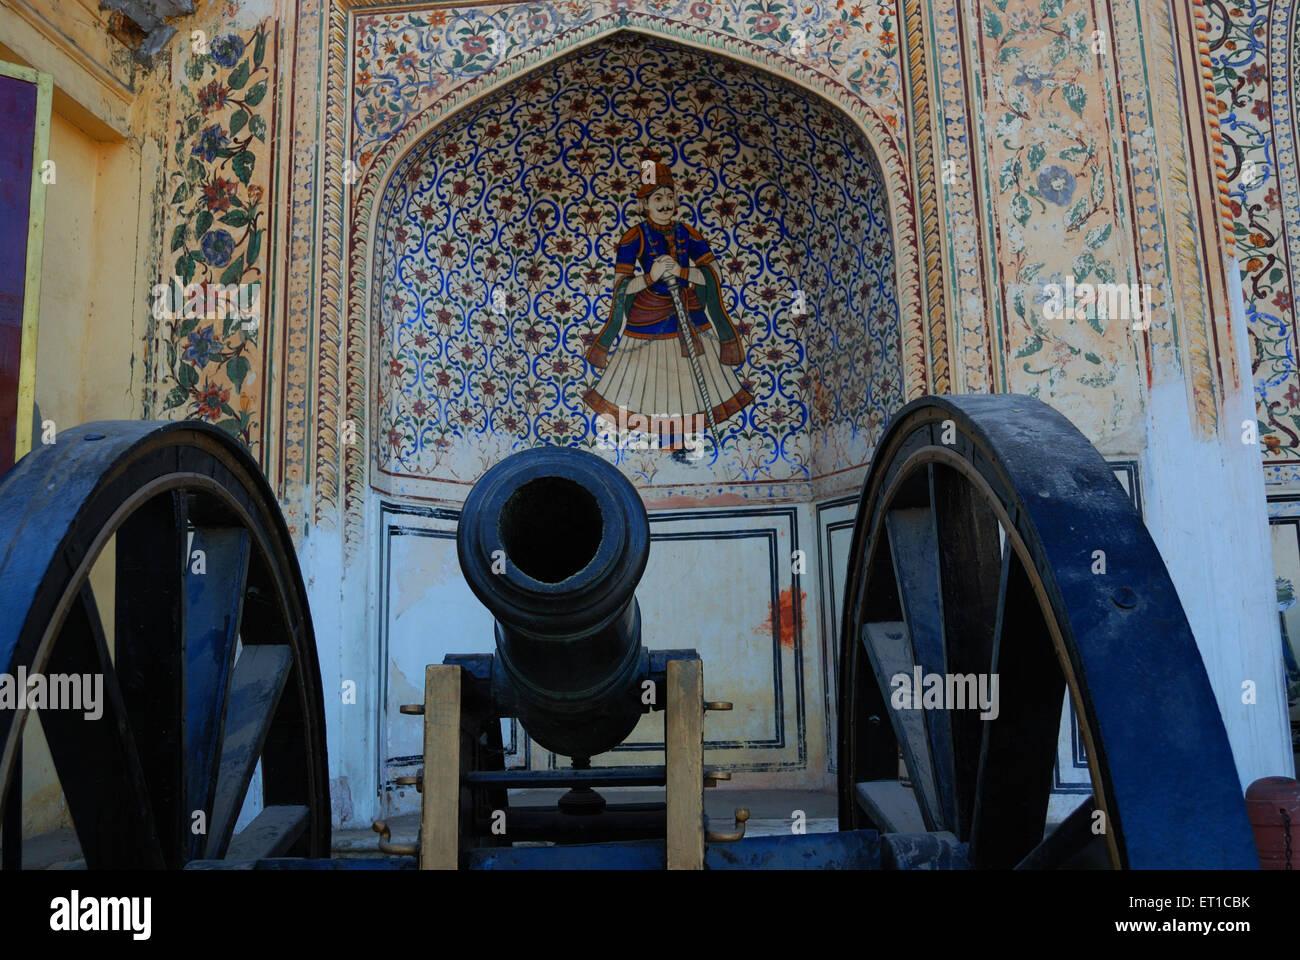 Cannon city Palace Jaipur Rajasthan India Asia Immagini Stock